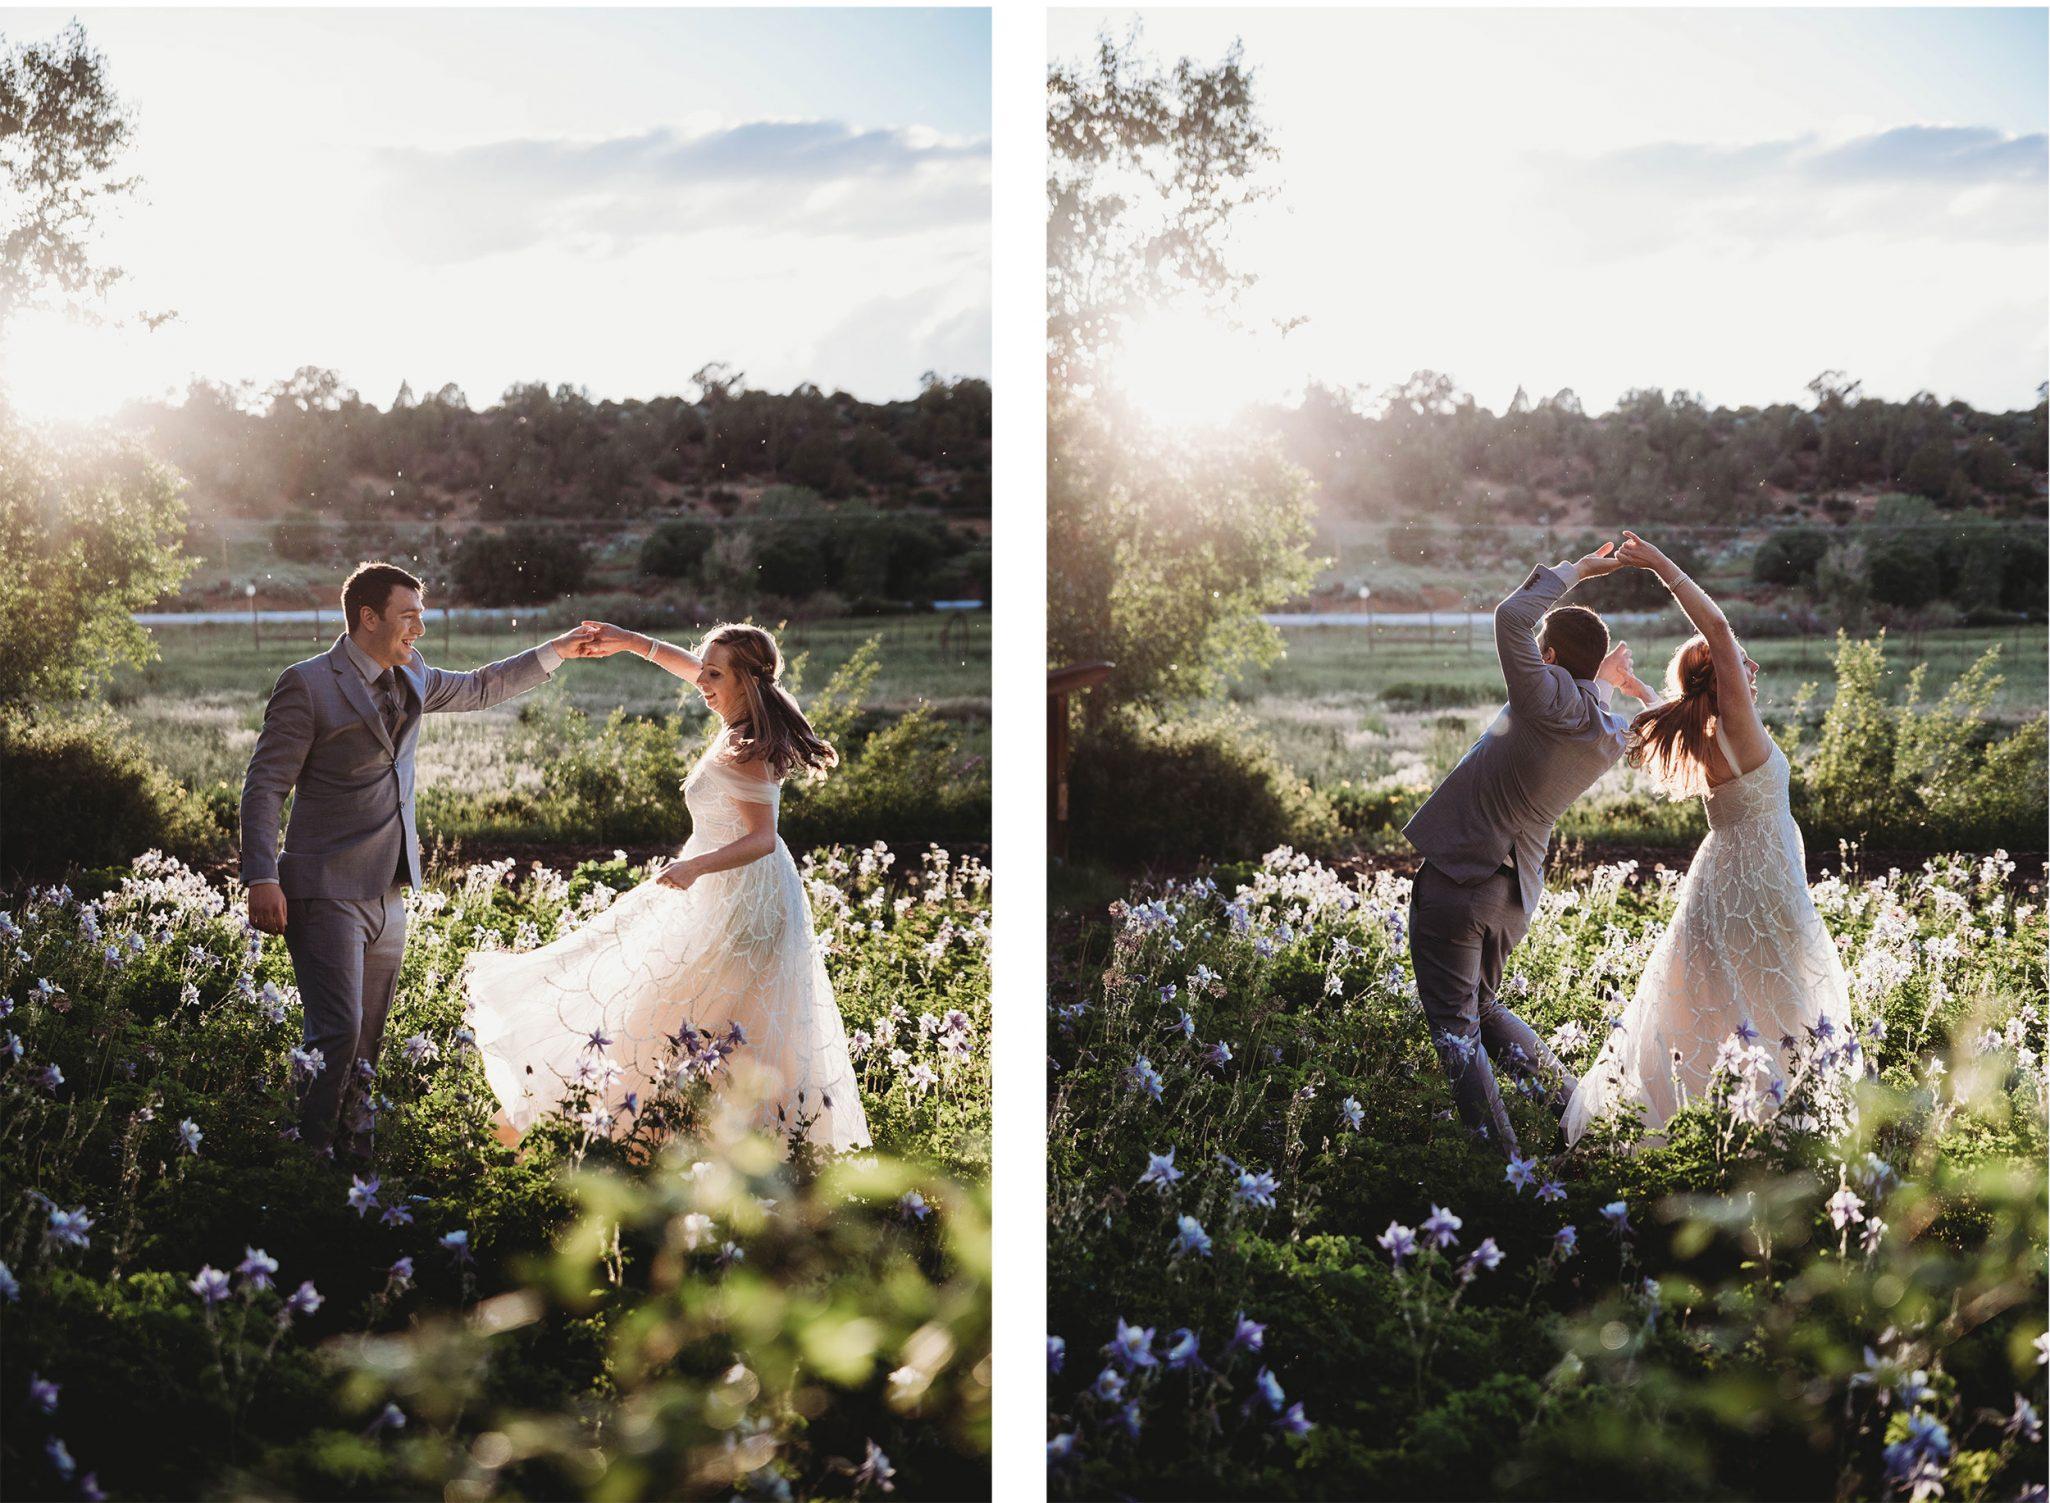 Bride & groom dancing in an iris field in Durango Colorado